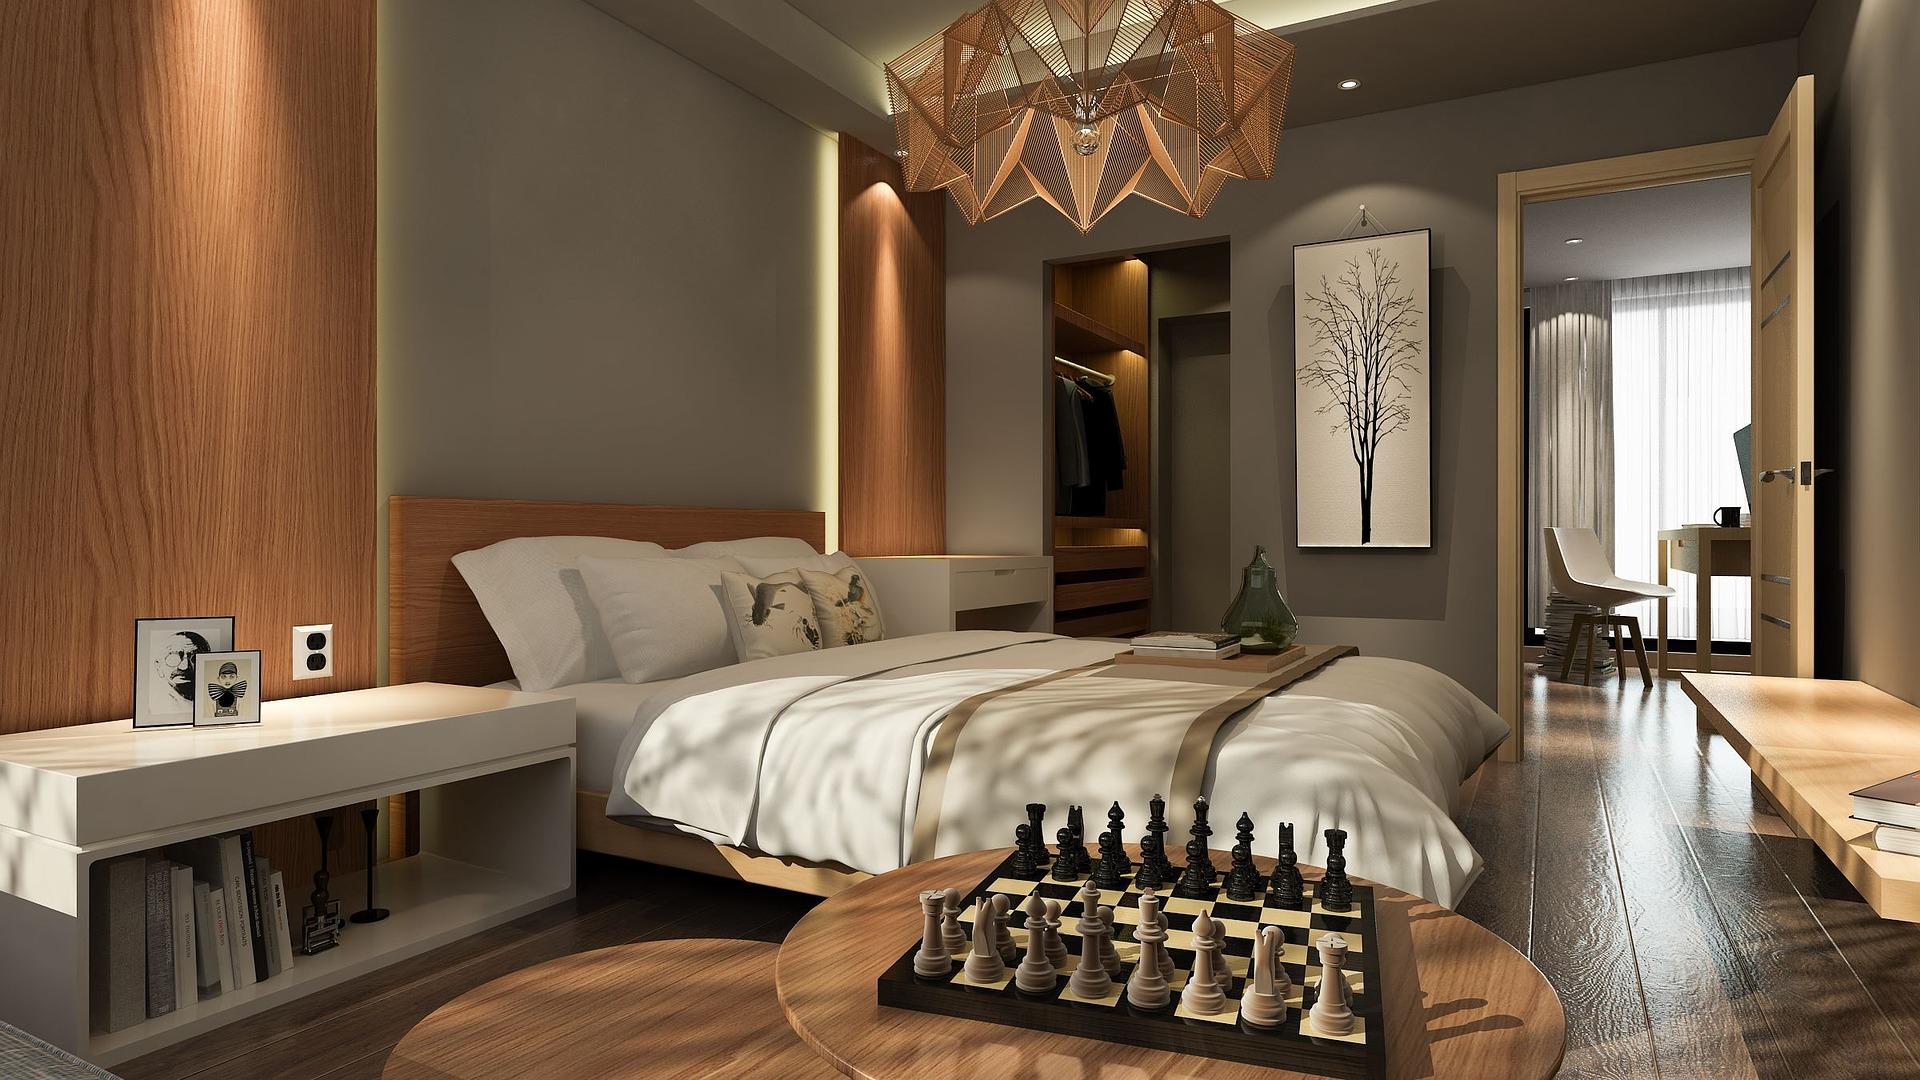 Спальня для мужчины дизайн фото